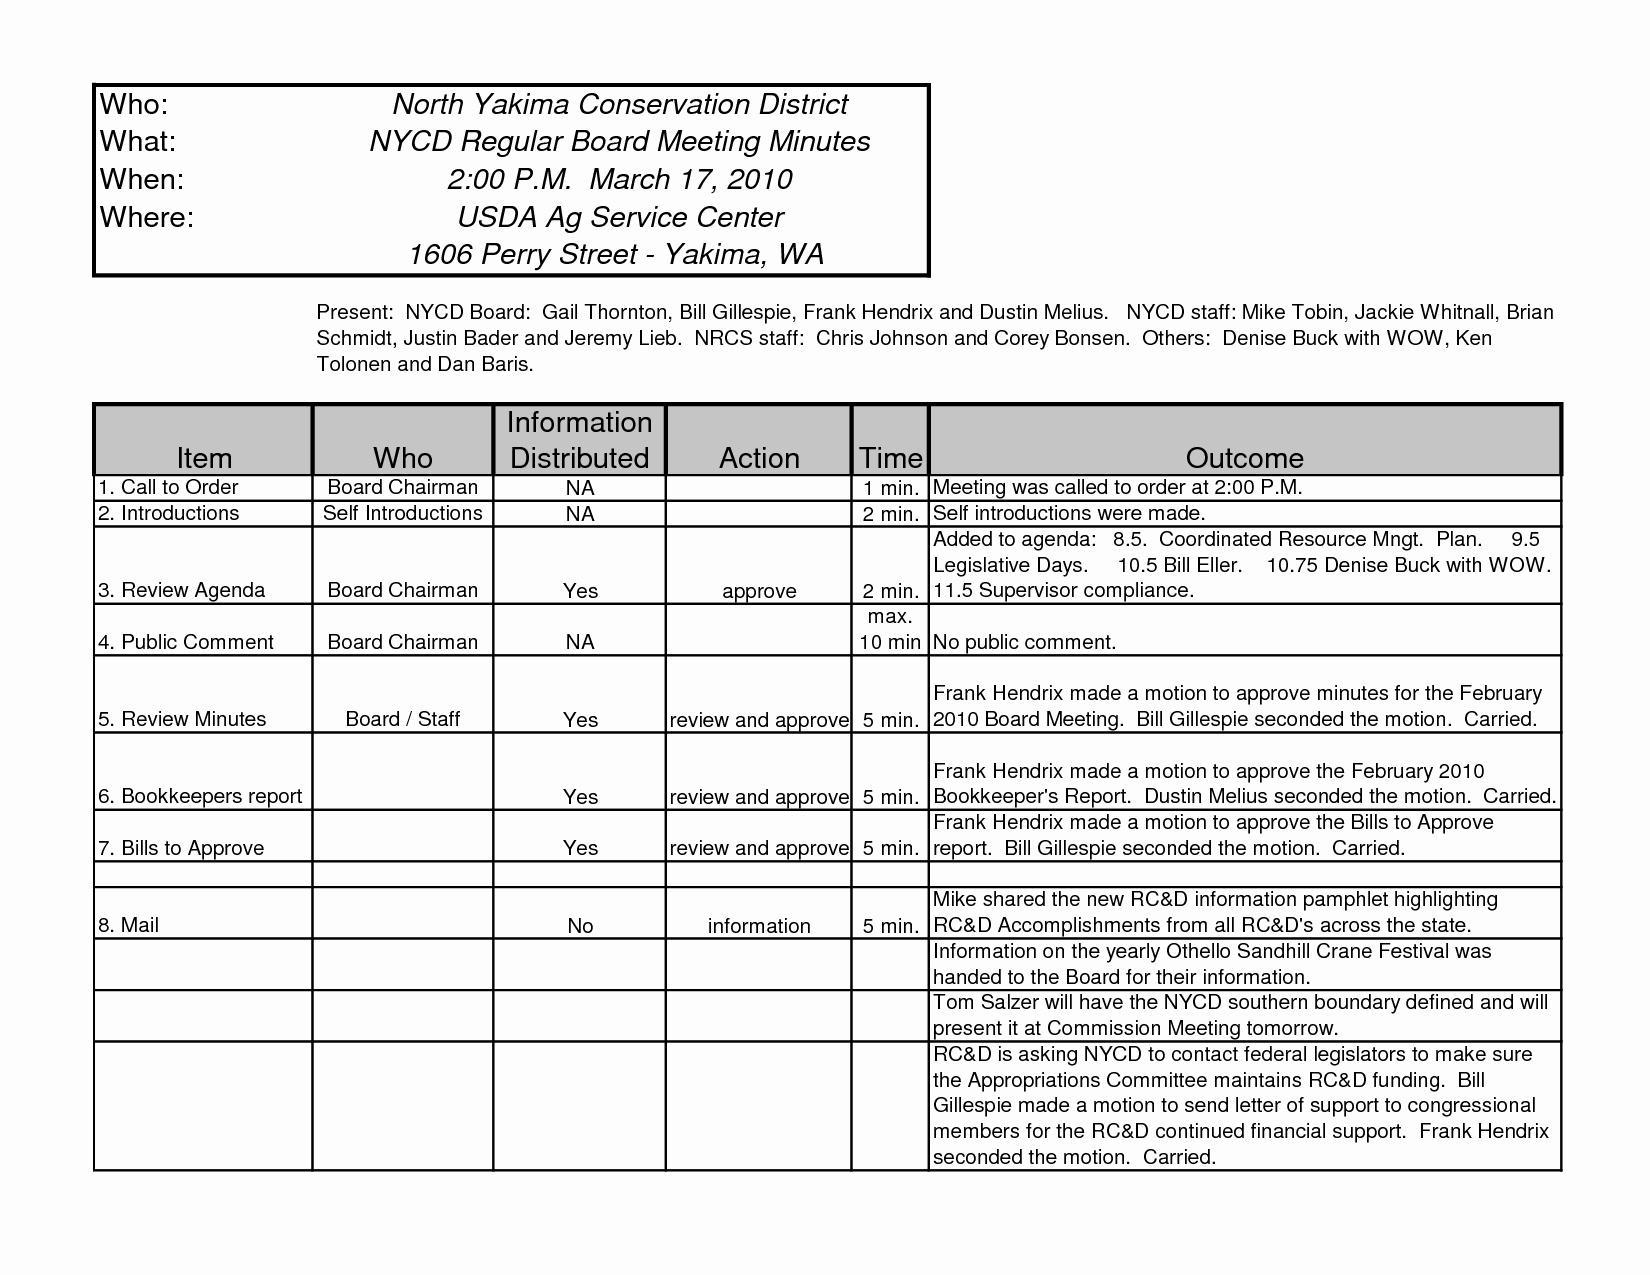 Excel Spreadsheet Agenda Template